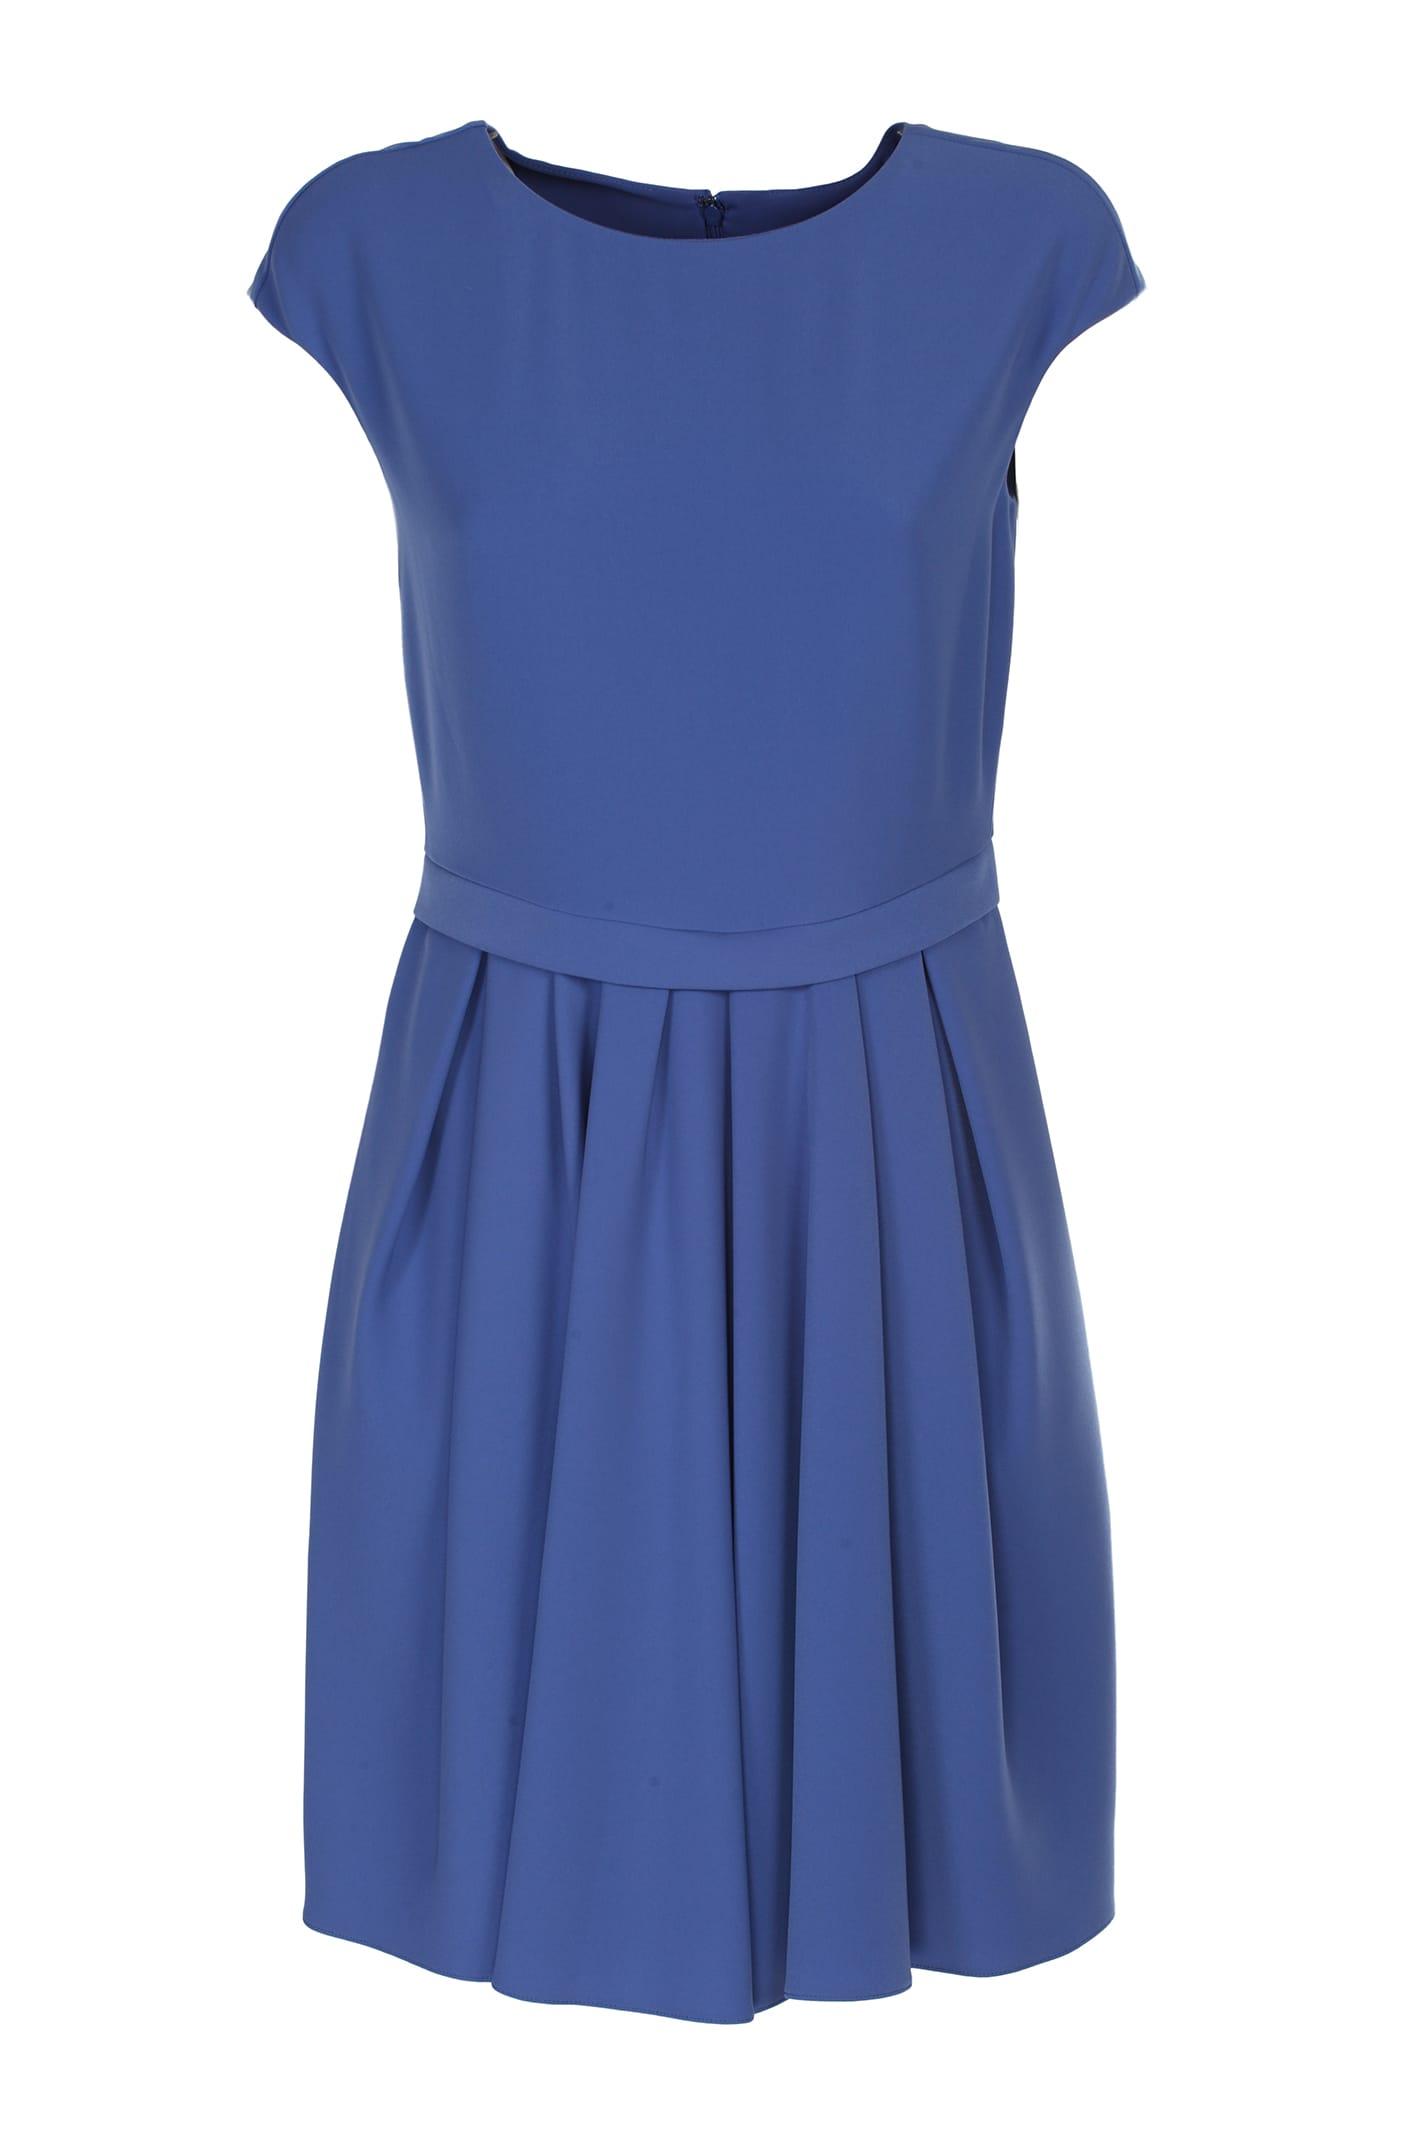 Buy Emporio Armani dress online, shop Emporio Armani with free shipping